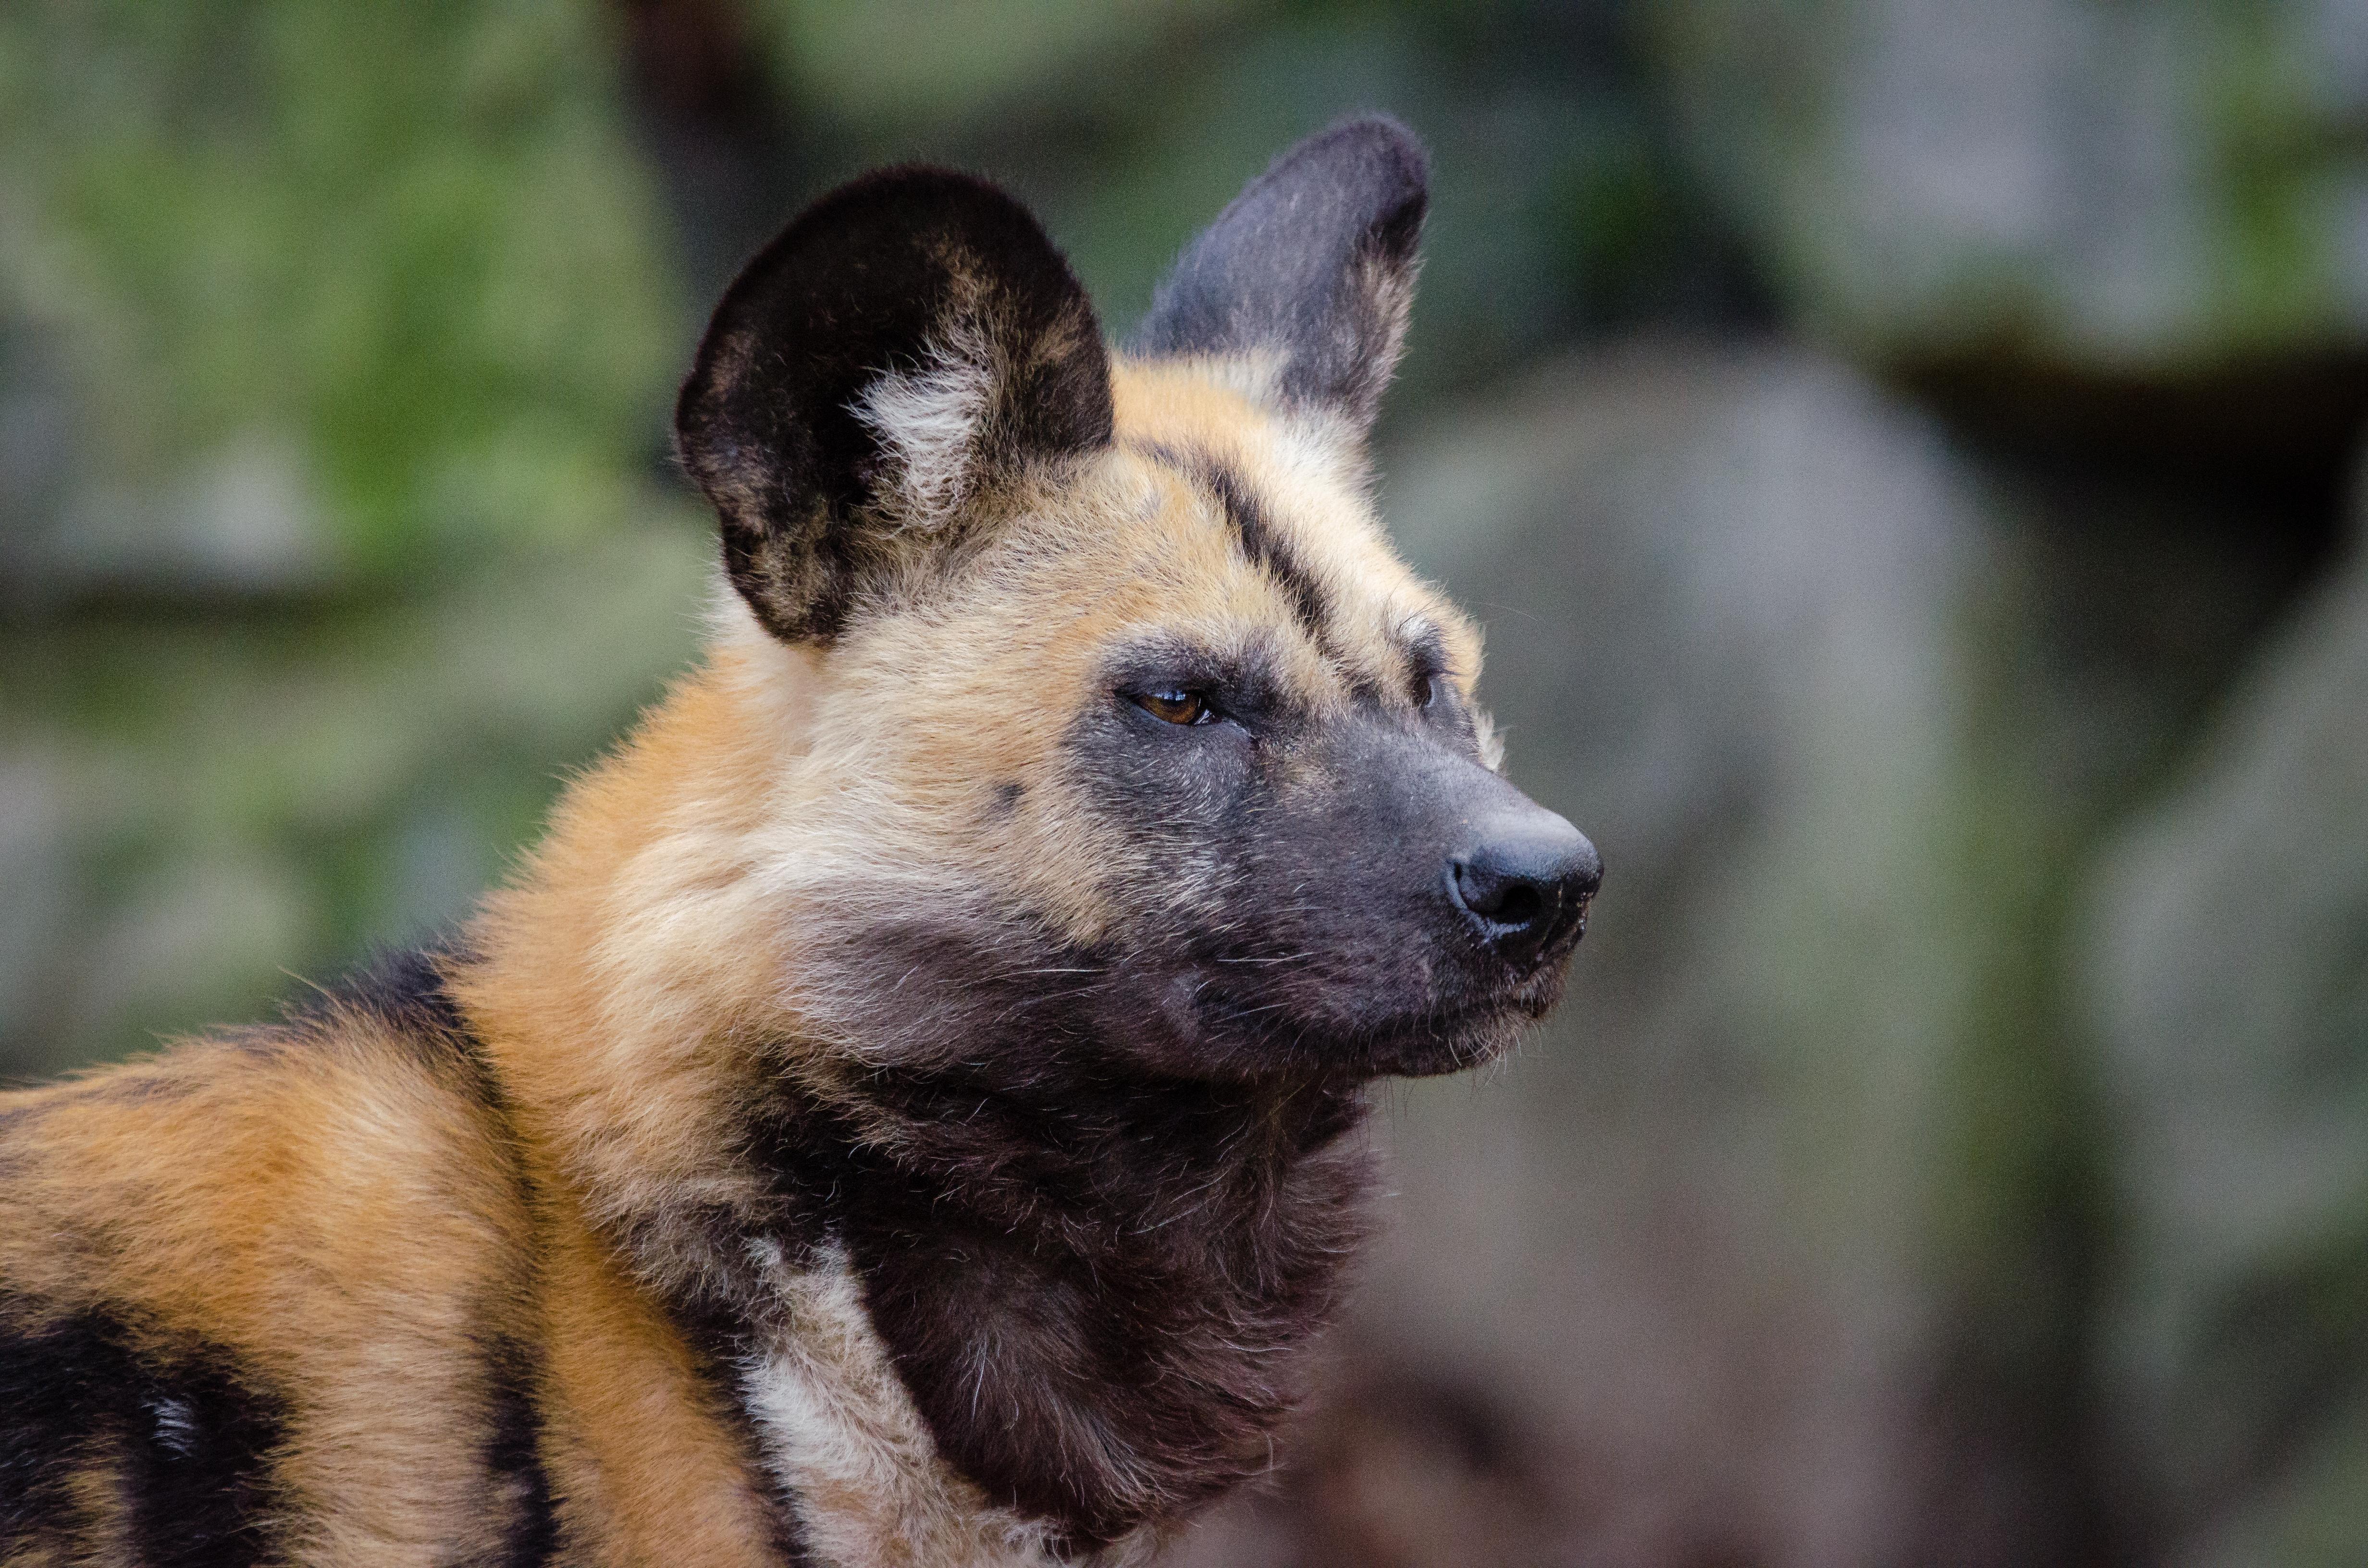 African wild dog, Painted, Pelz, Pelzig, Ohren, HQ Photo